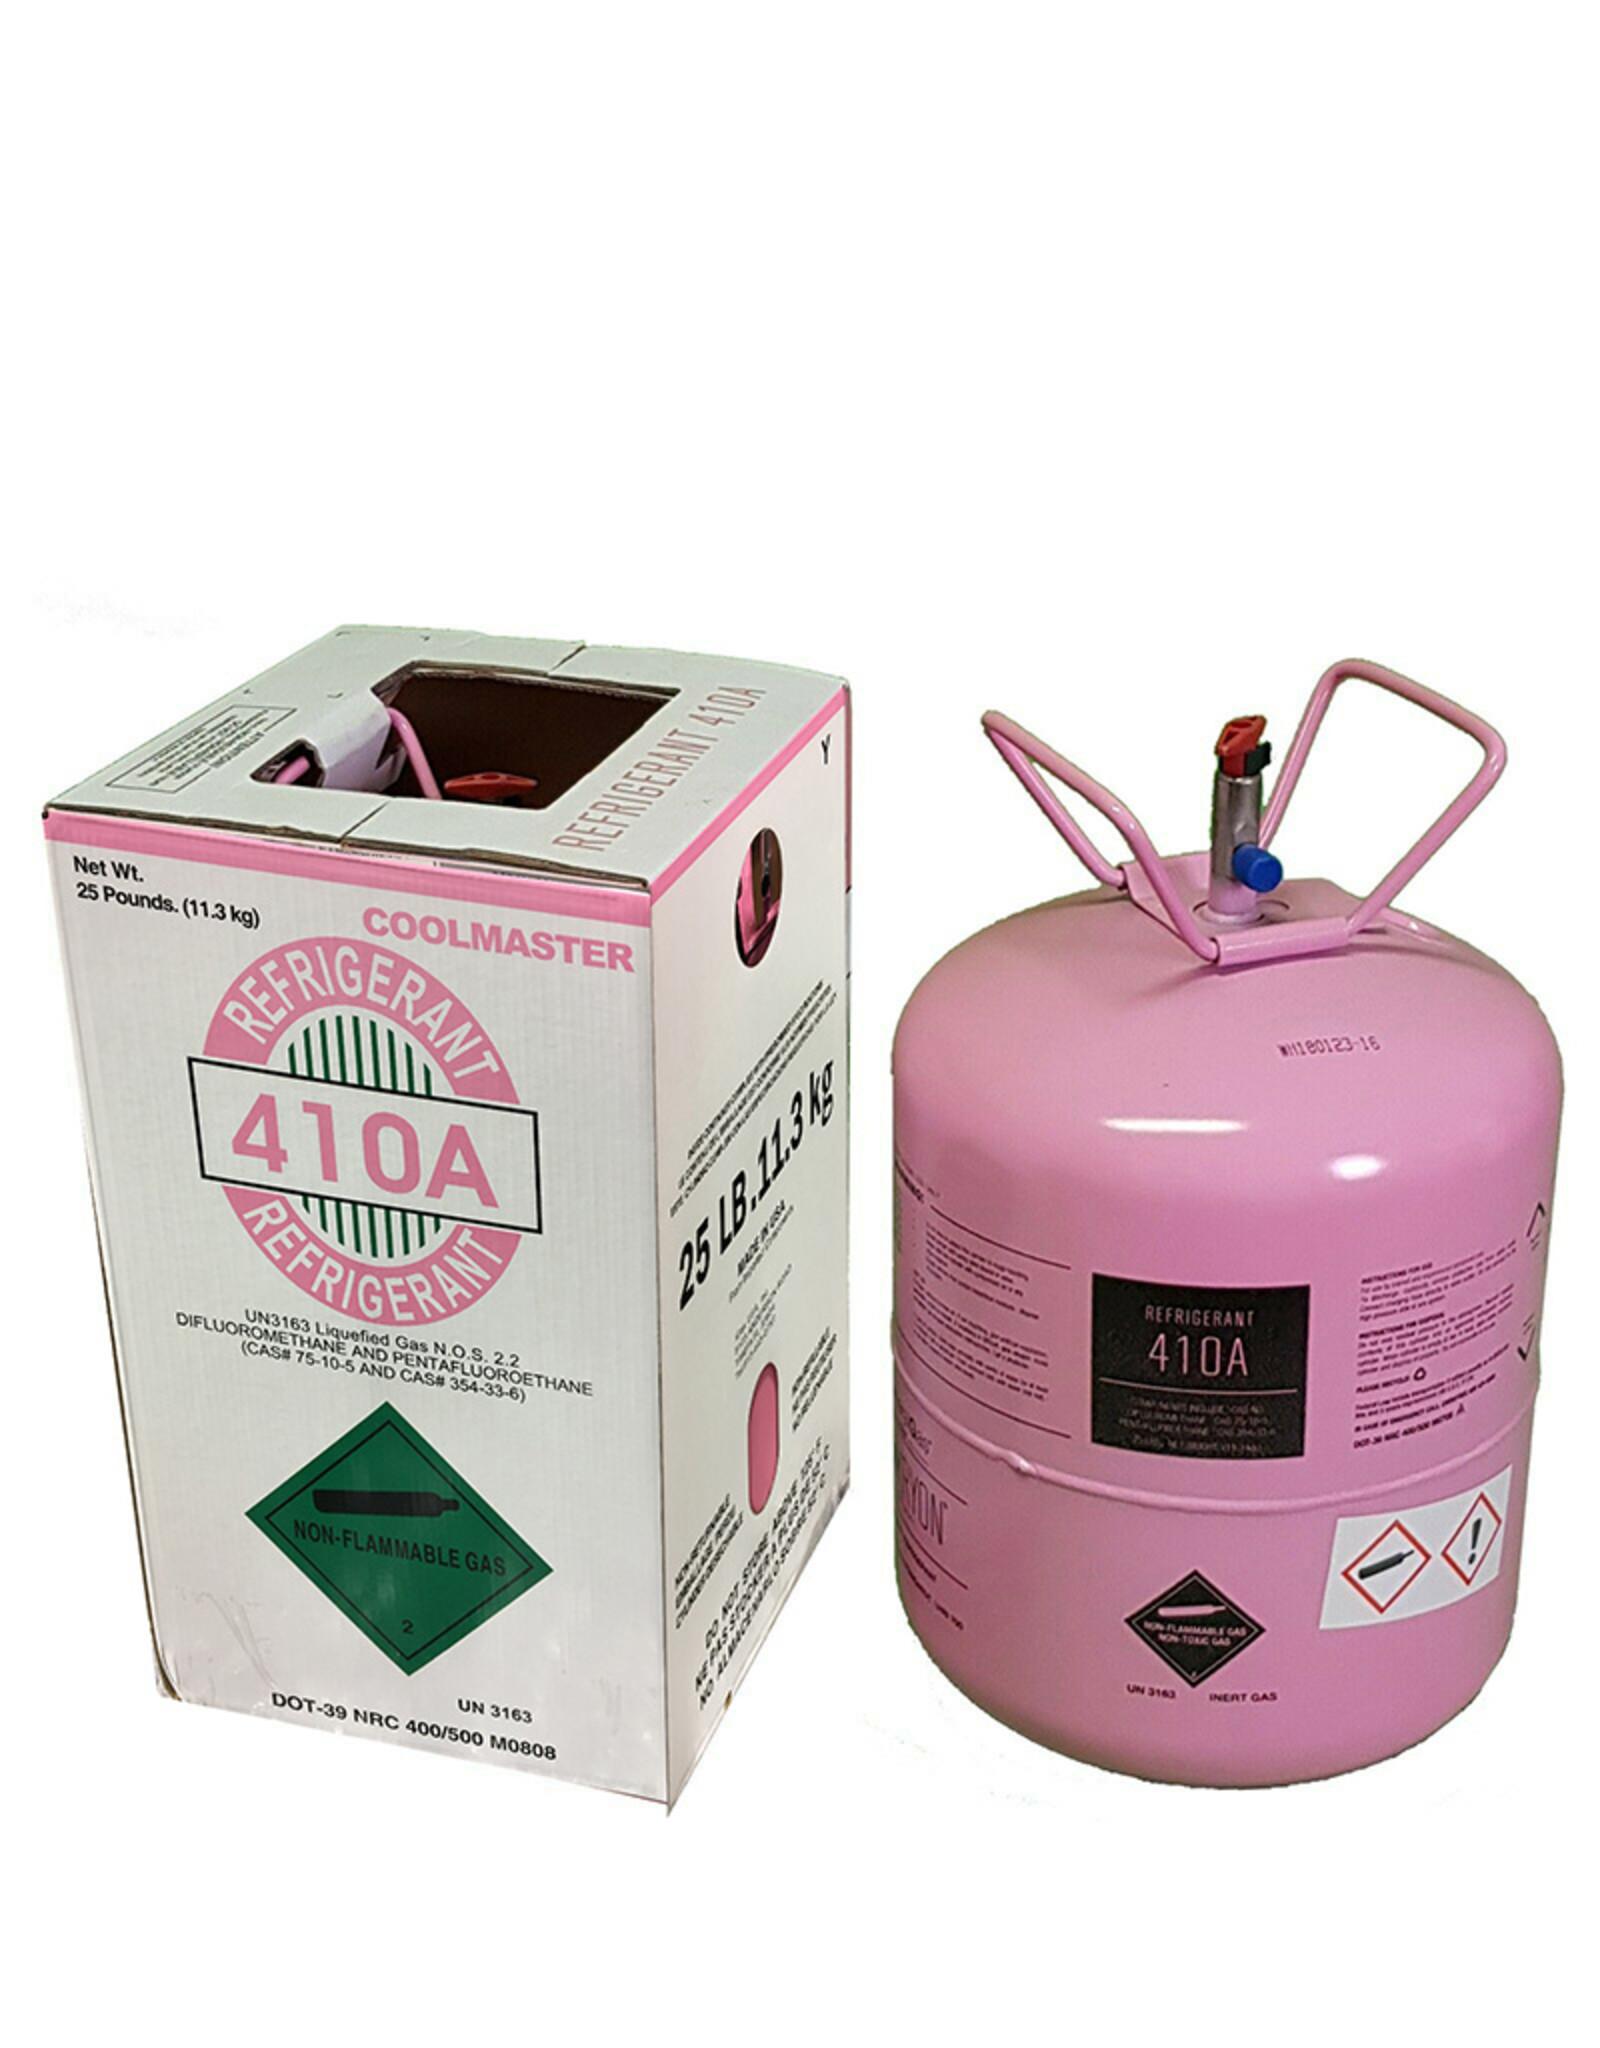 410A 25lbs Drum Refrigerant